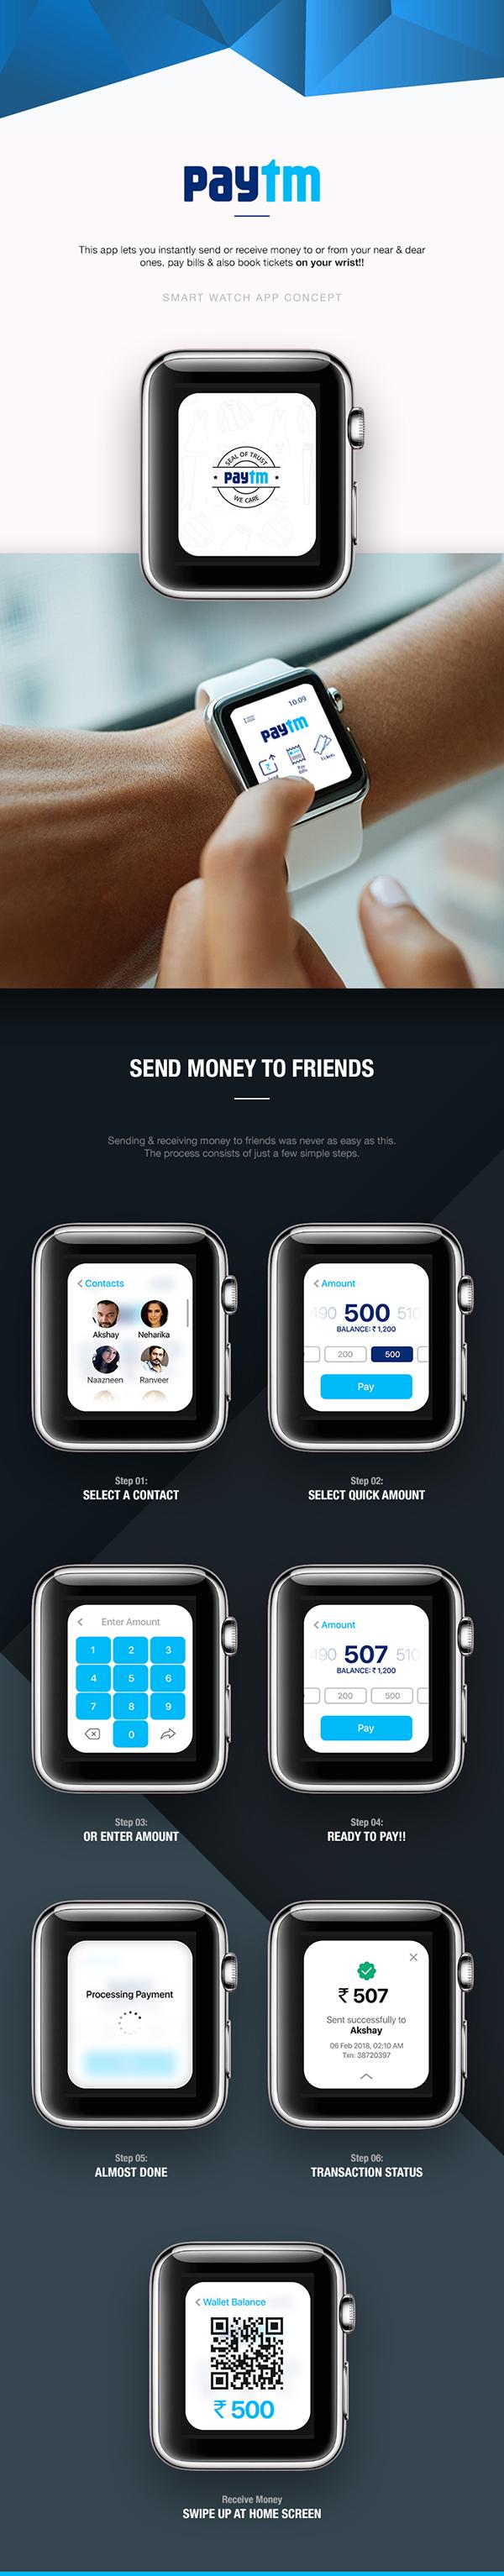 Paytm [Smart Watch App Concept]